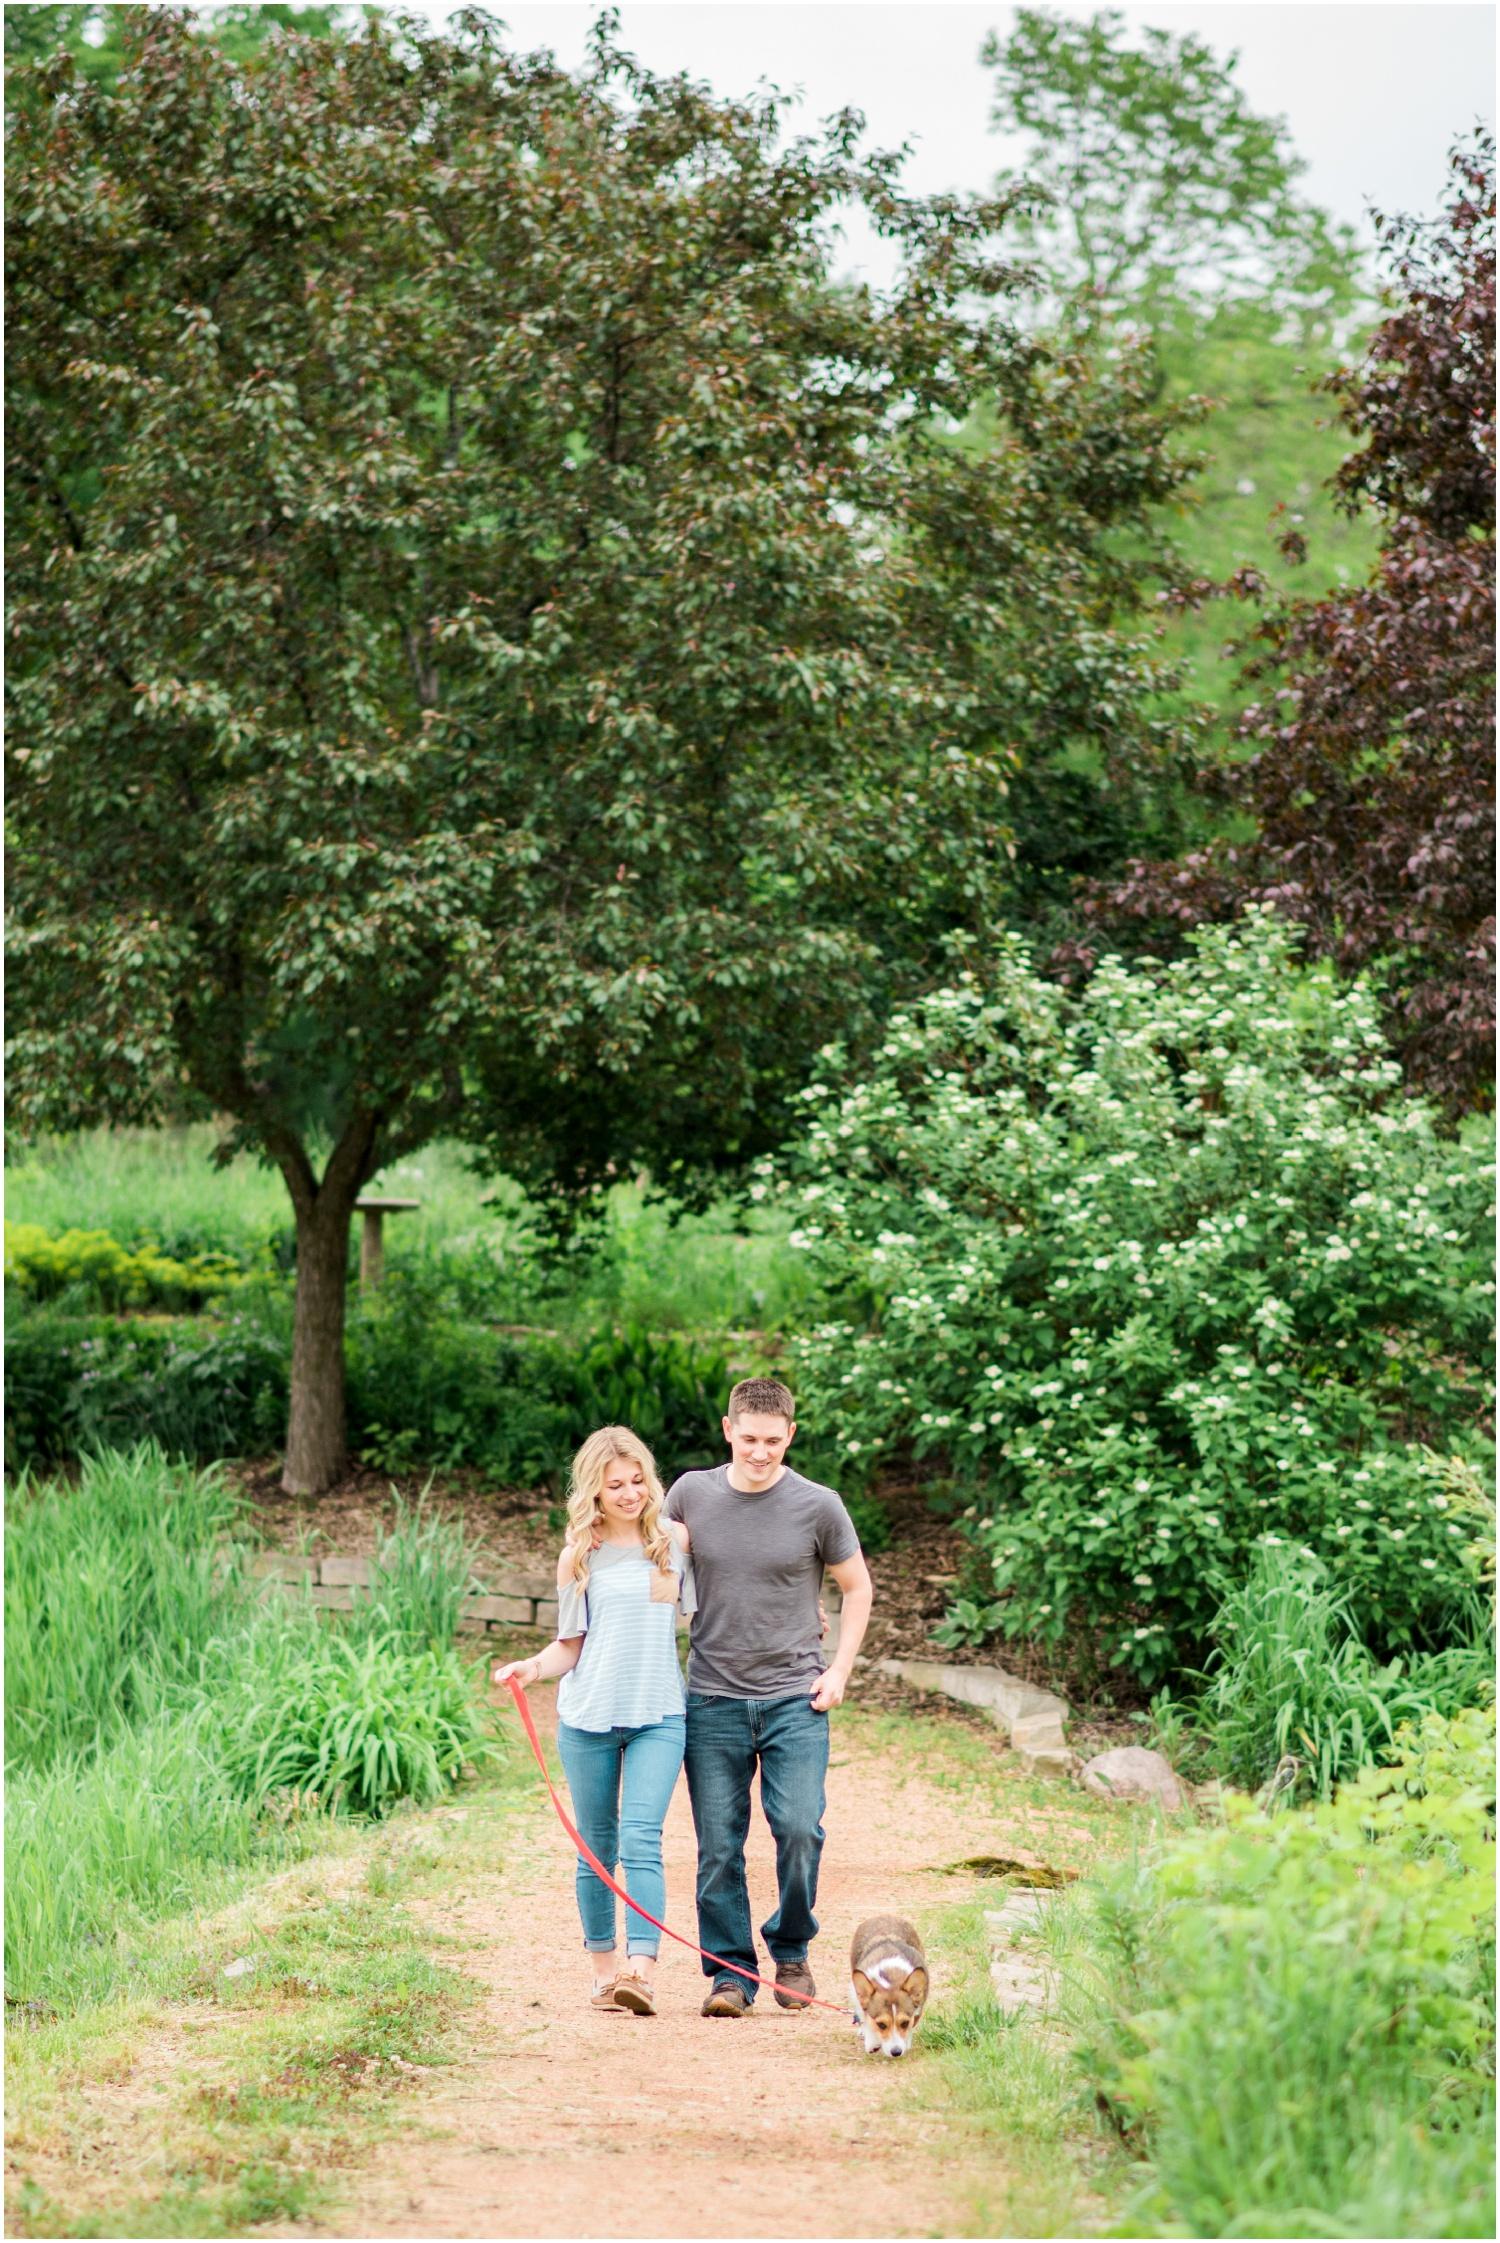 Paquette_Park_Portage_WI_Engagement_Photos_Heather_and_Derek_0007.jpg